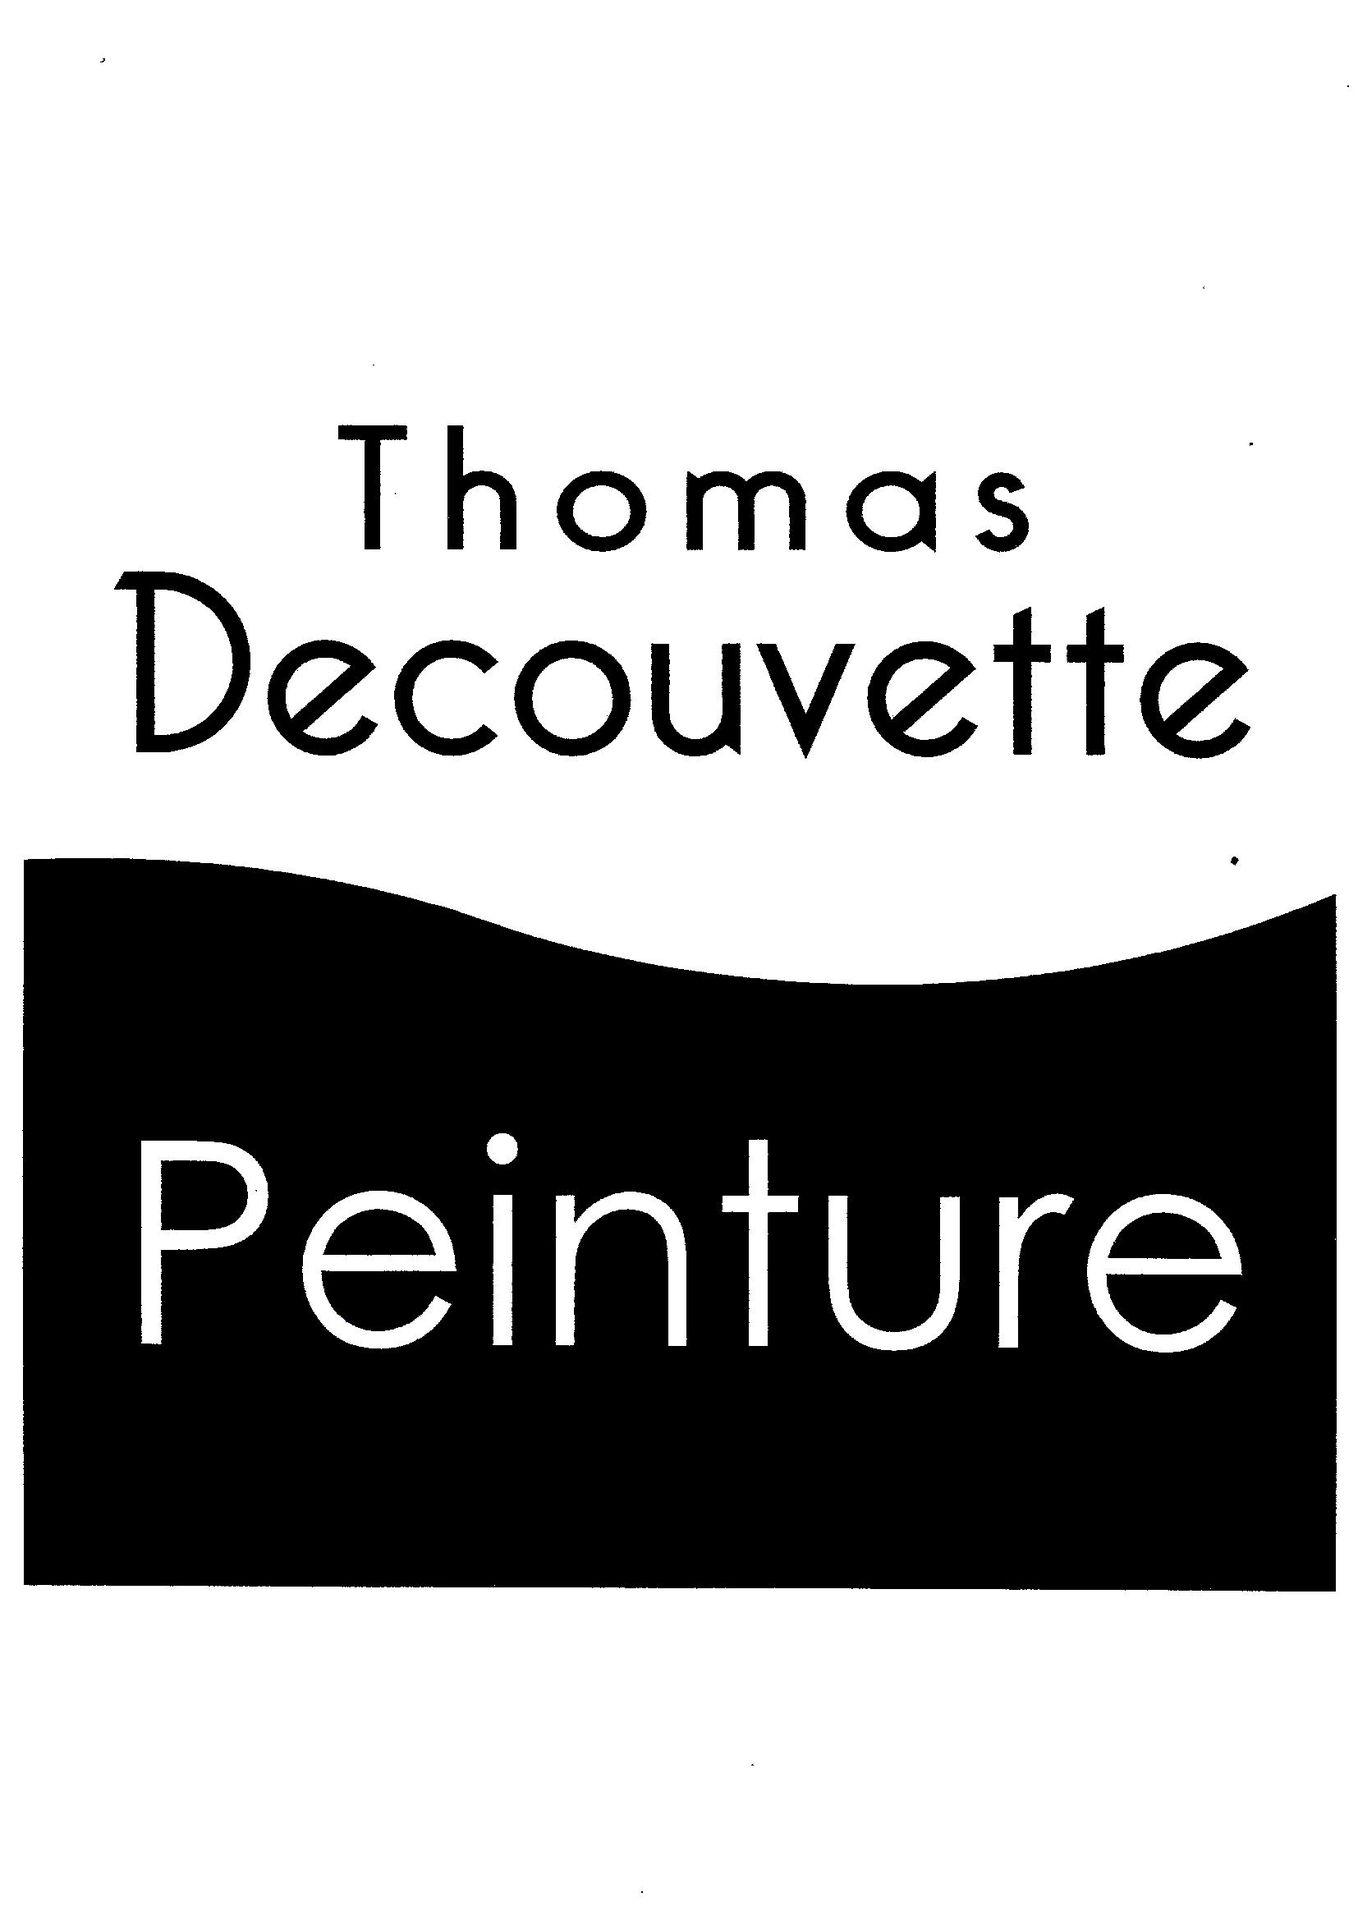 Decouvette Thomas